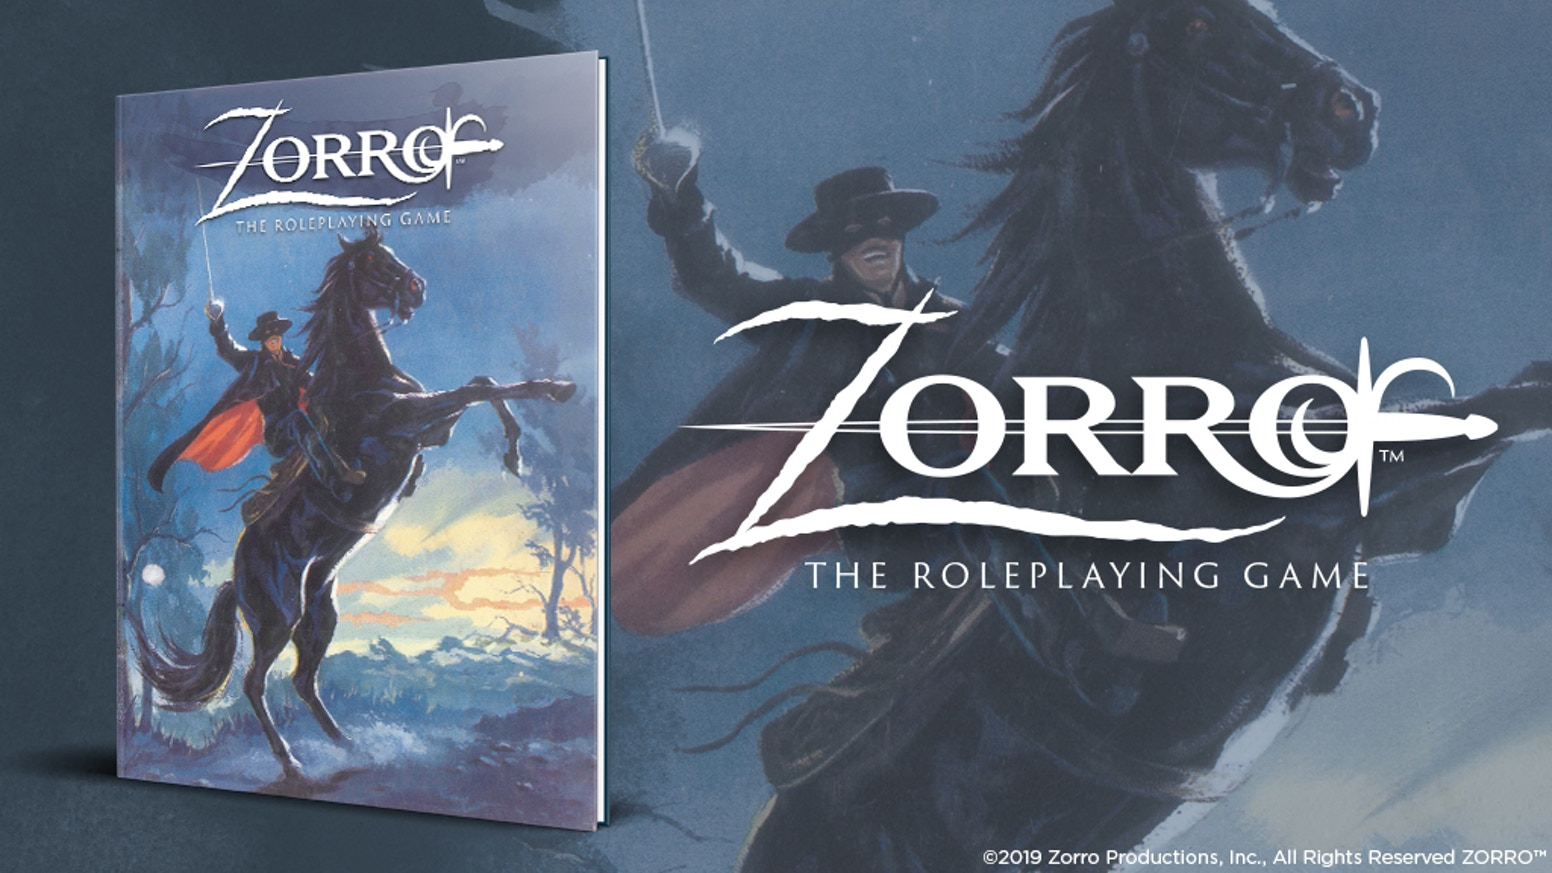 Zorro: The Roleplaying Game Kickstarter